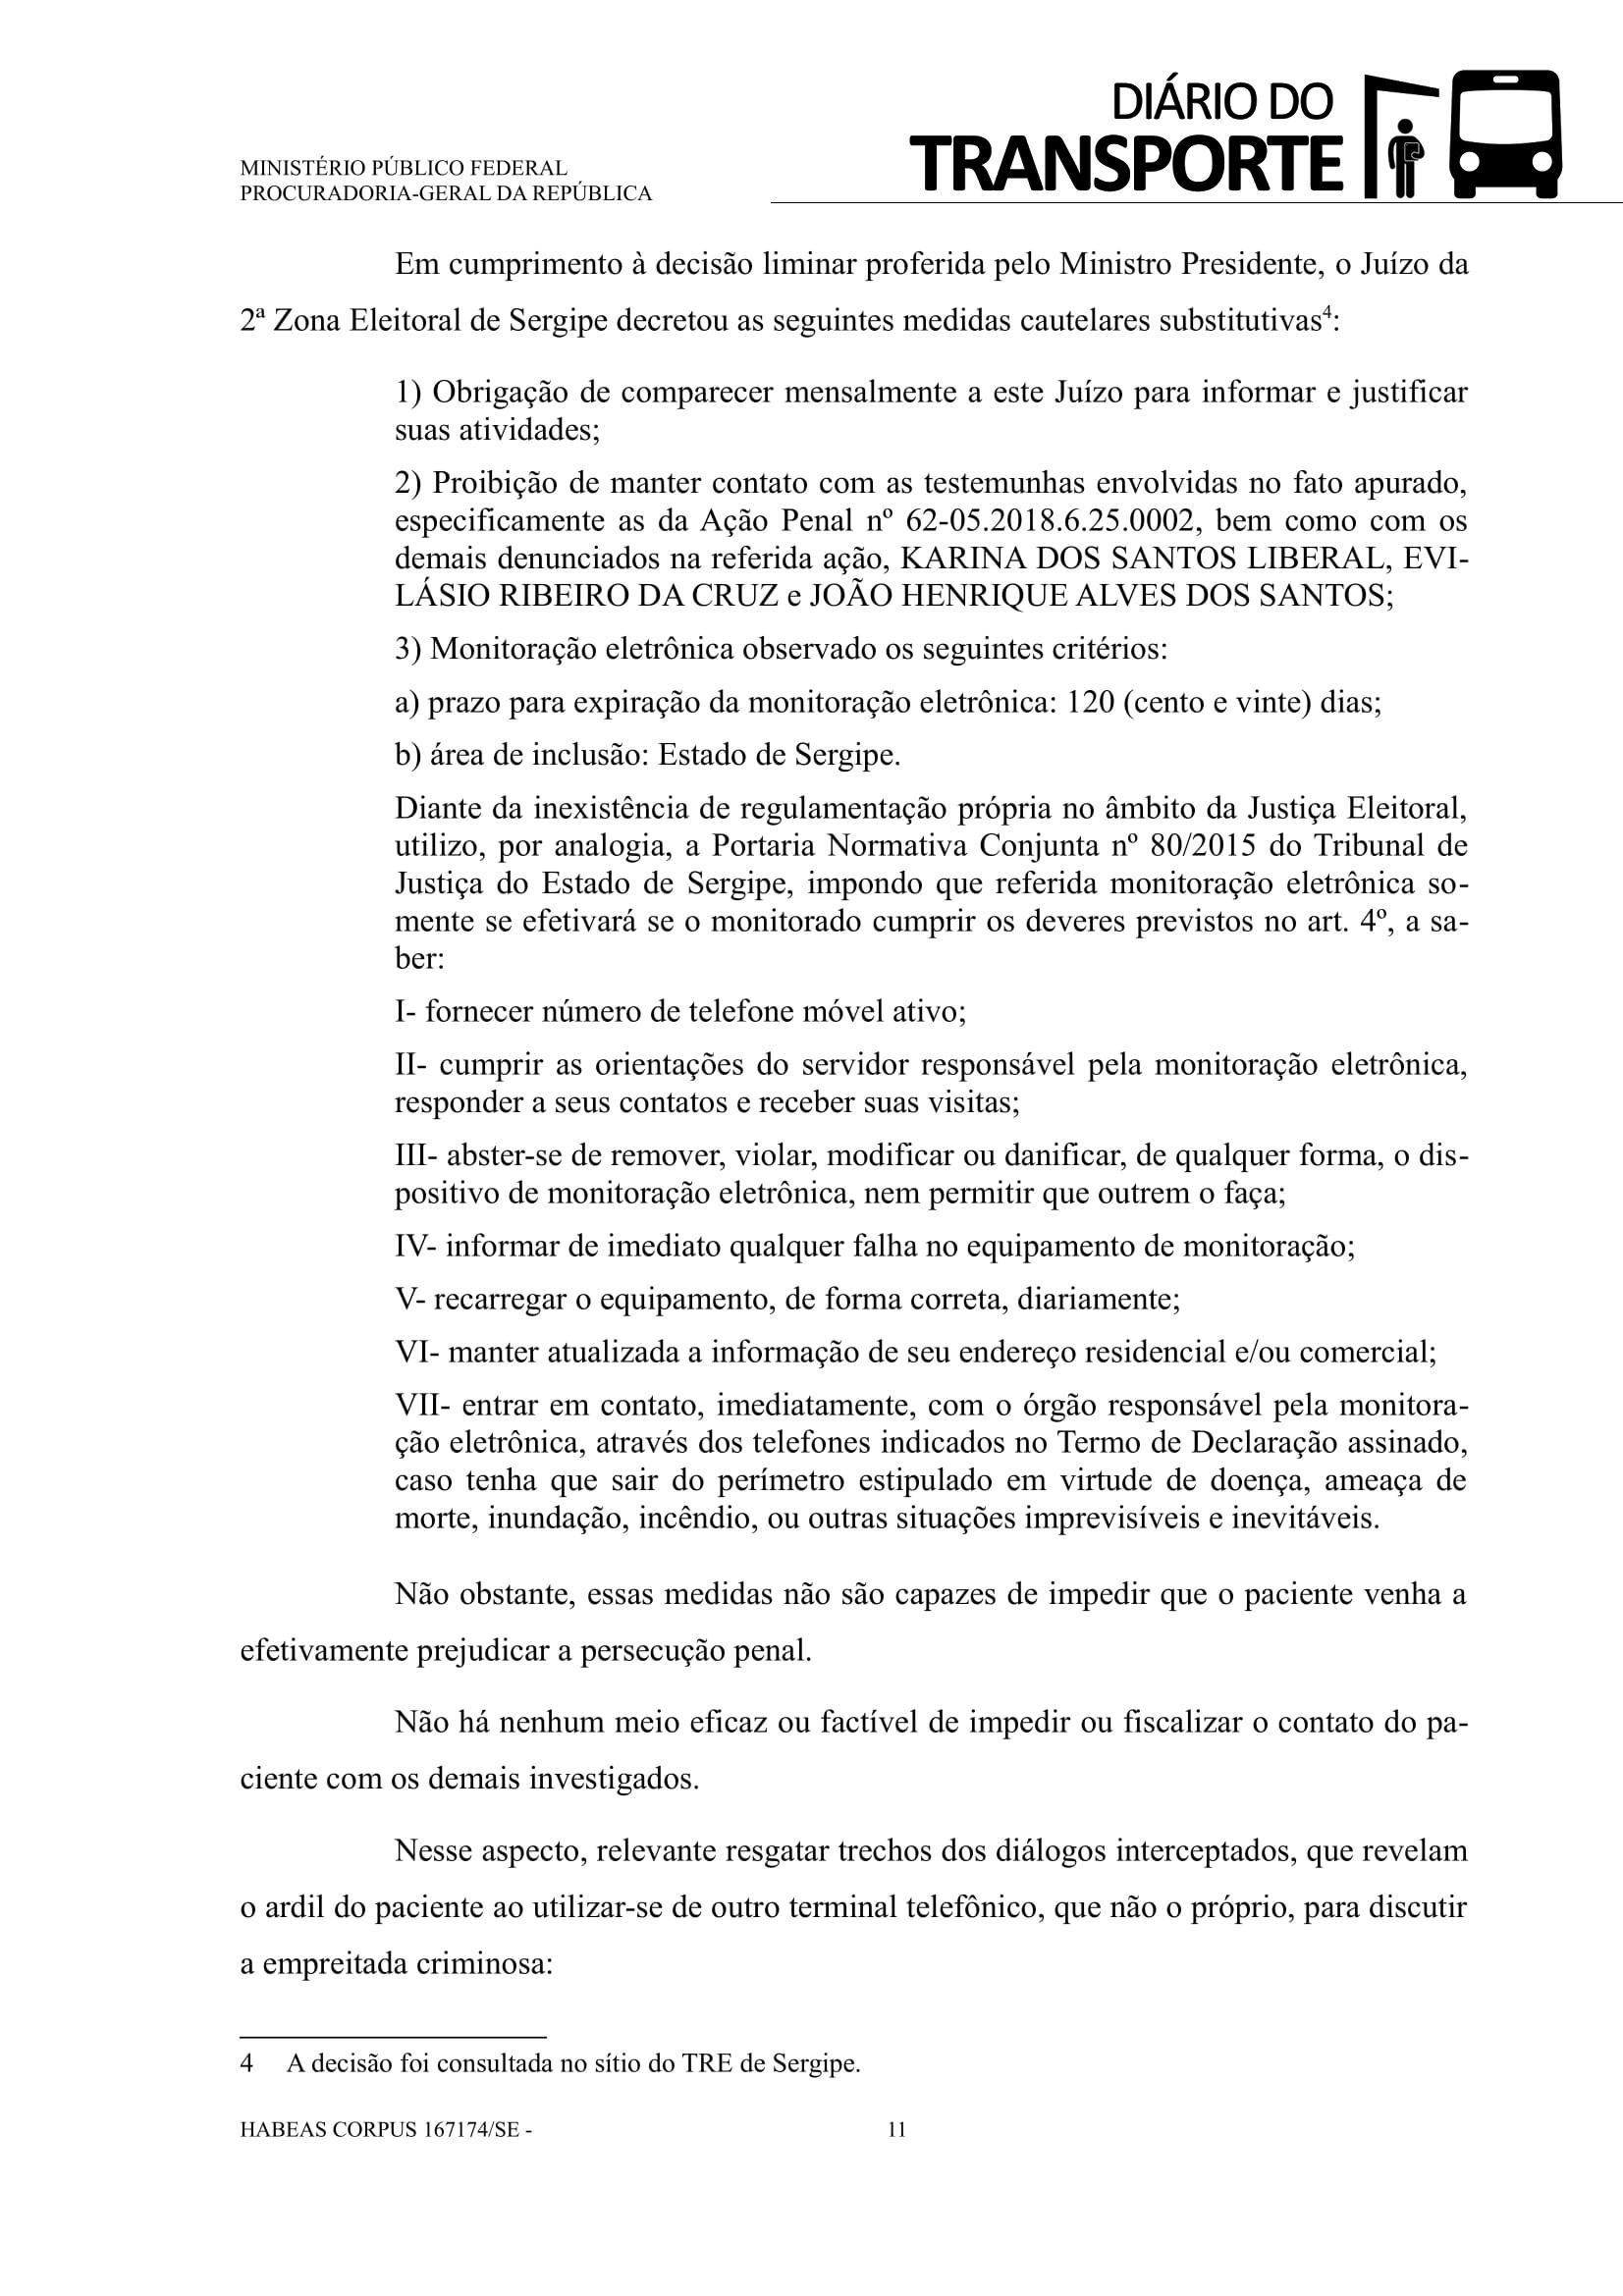 HC 167174_ContrarrazoesAgravo_Jose Valdevan de Jesus Santos-11